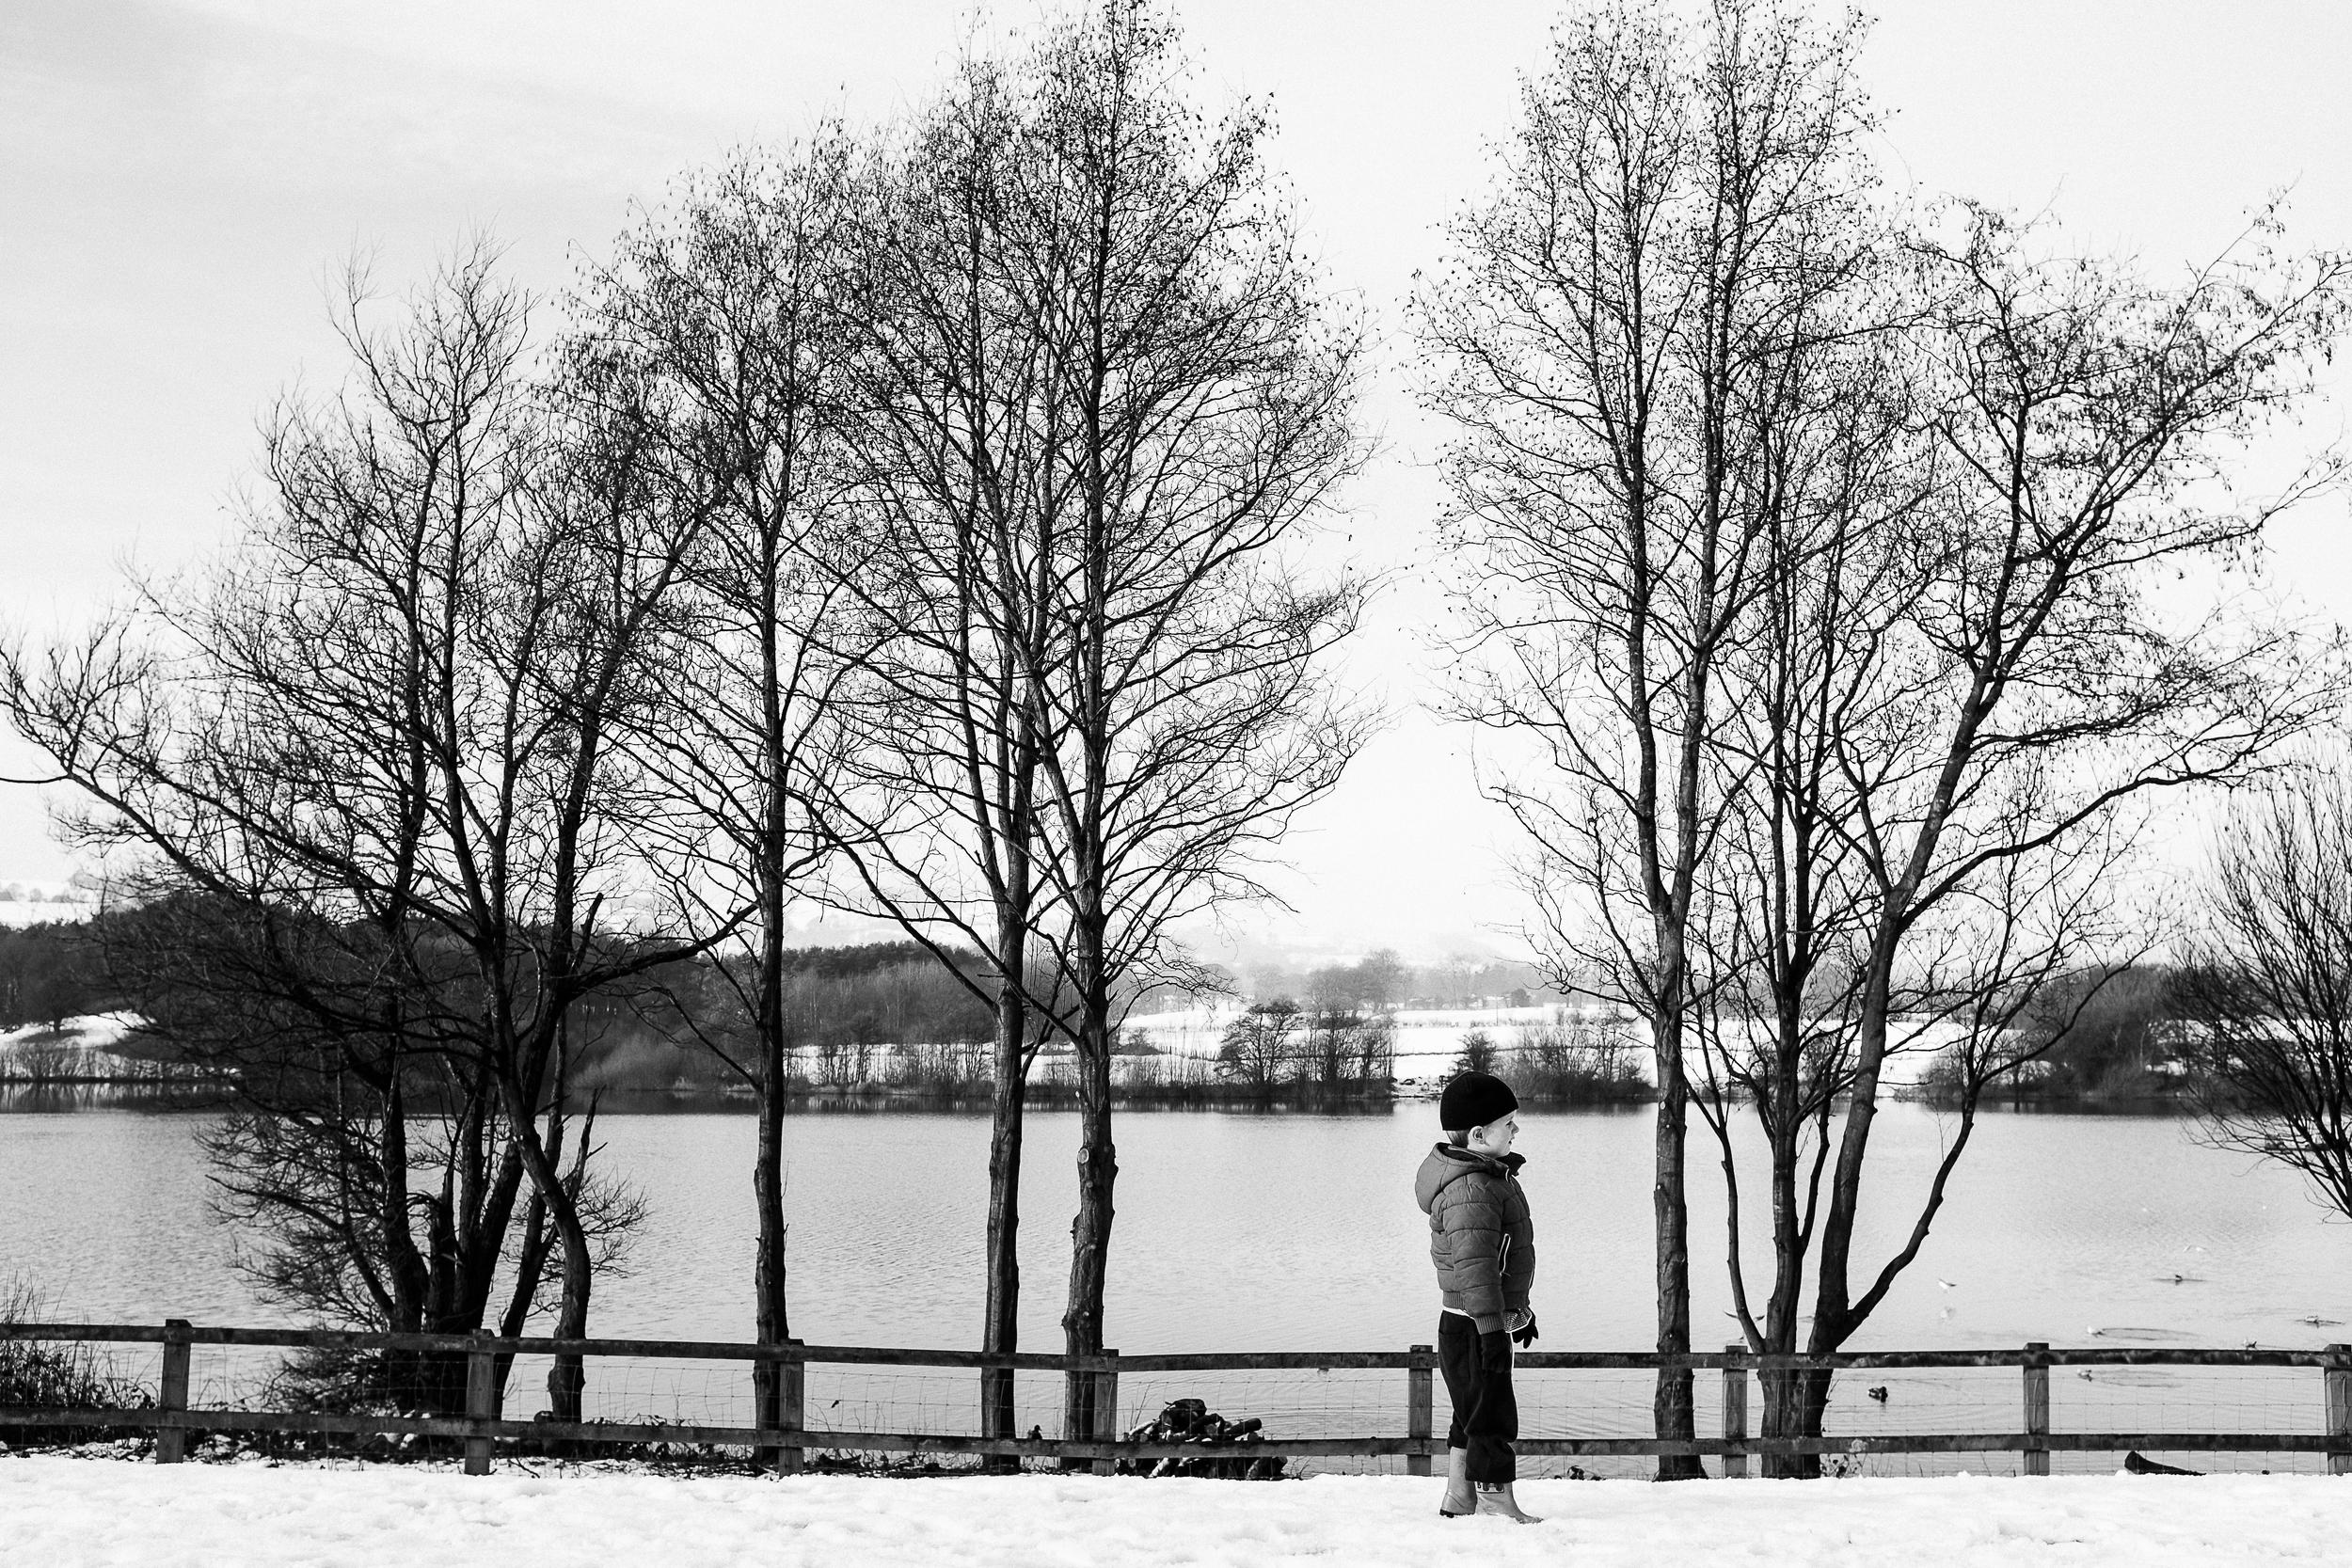 Winter  - Tittesworth Reservoir, Staffordshire - December 2014